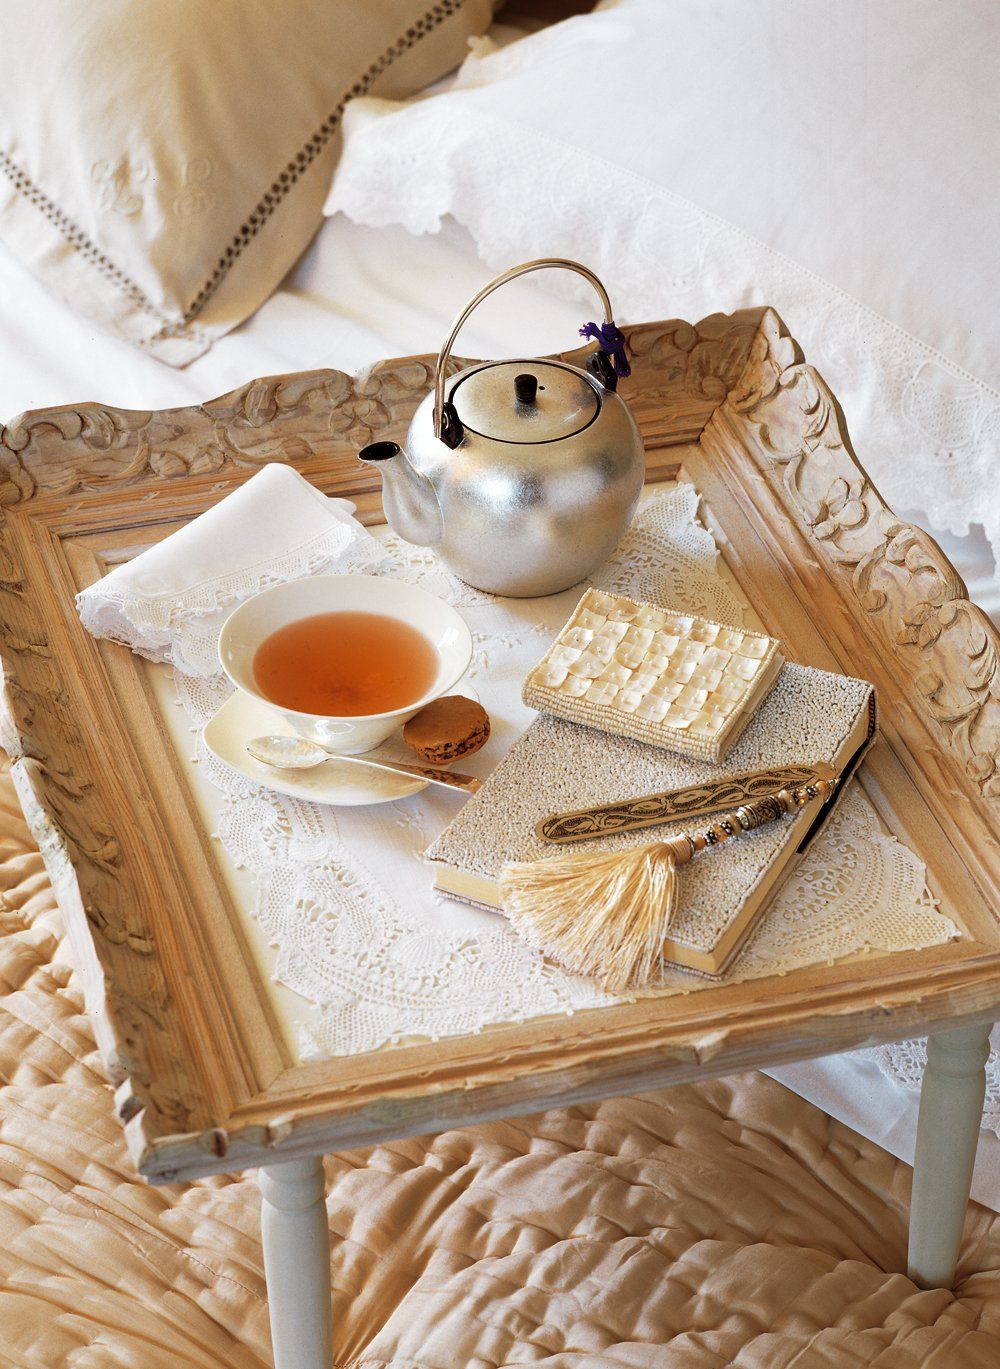 Un plateau de petitdéjeuner dans un cadre ancien